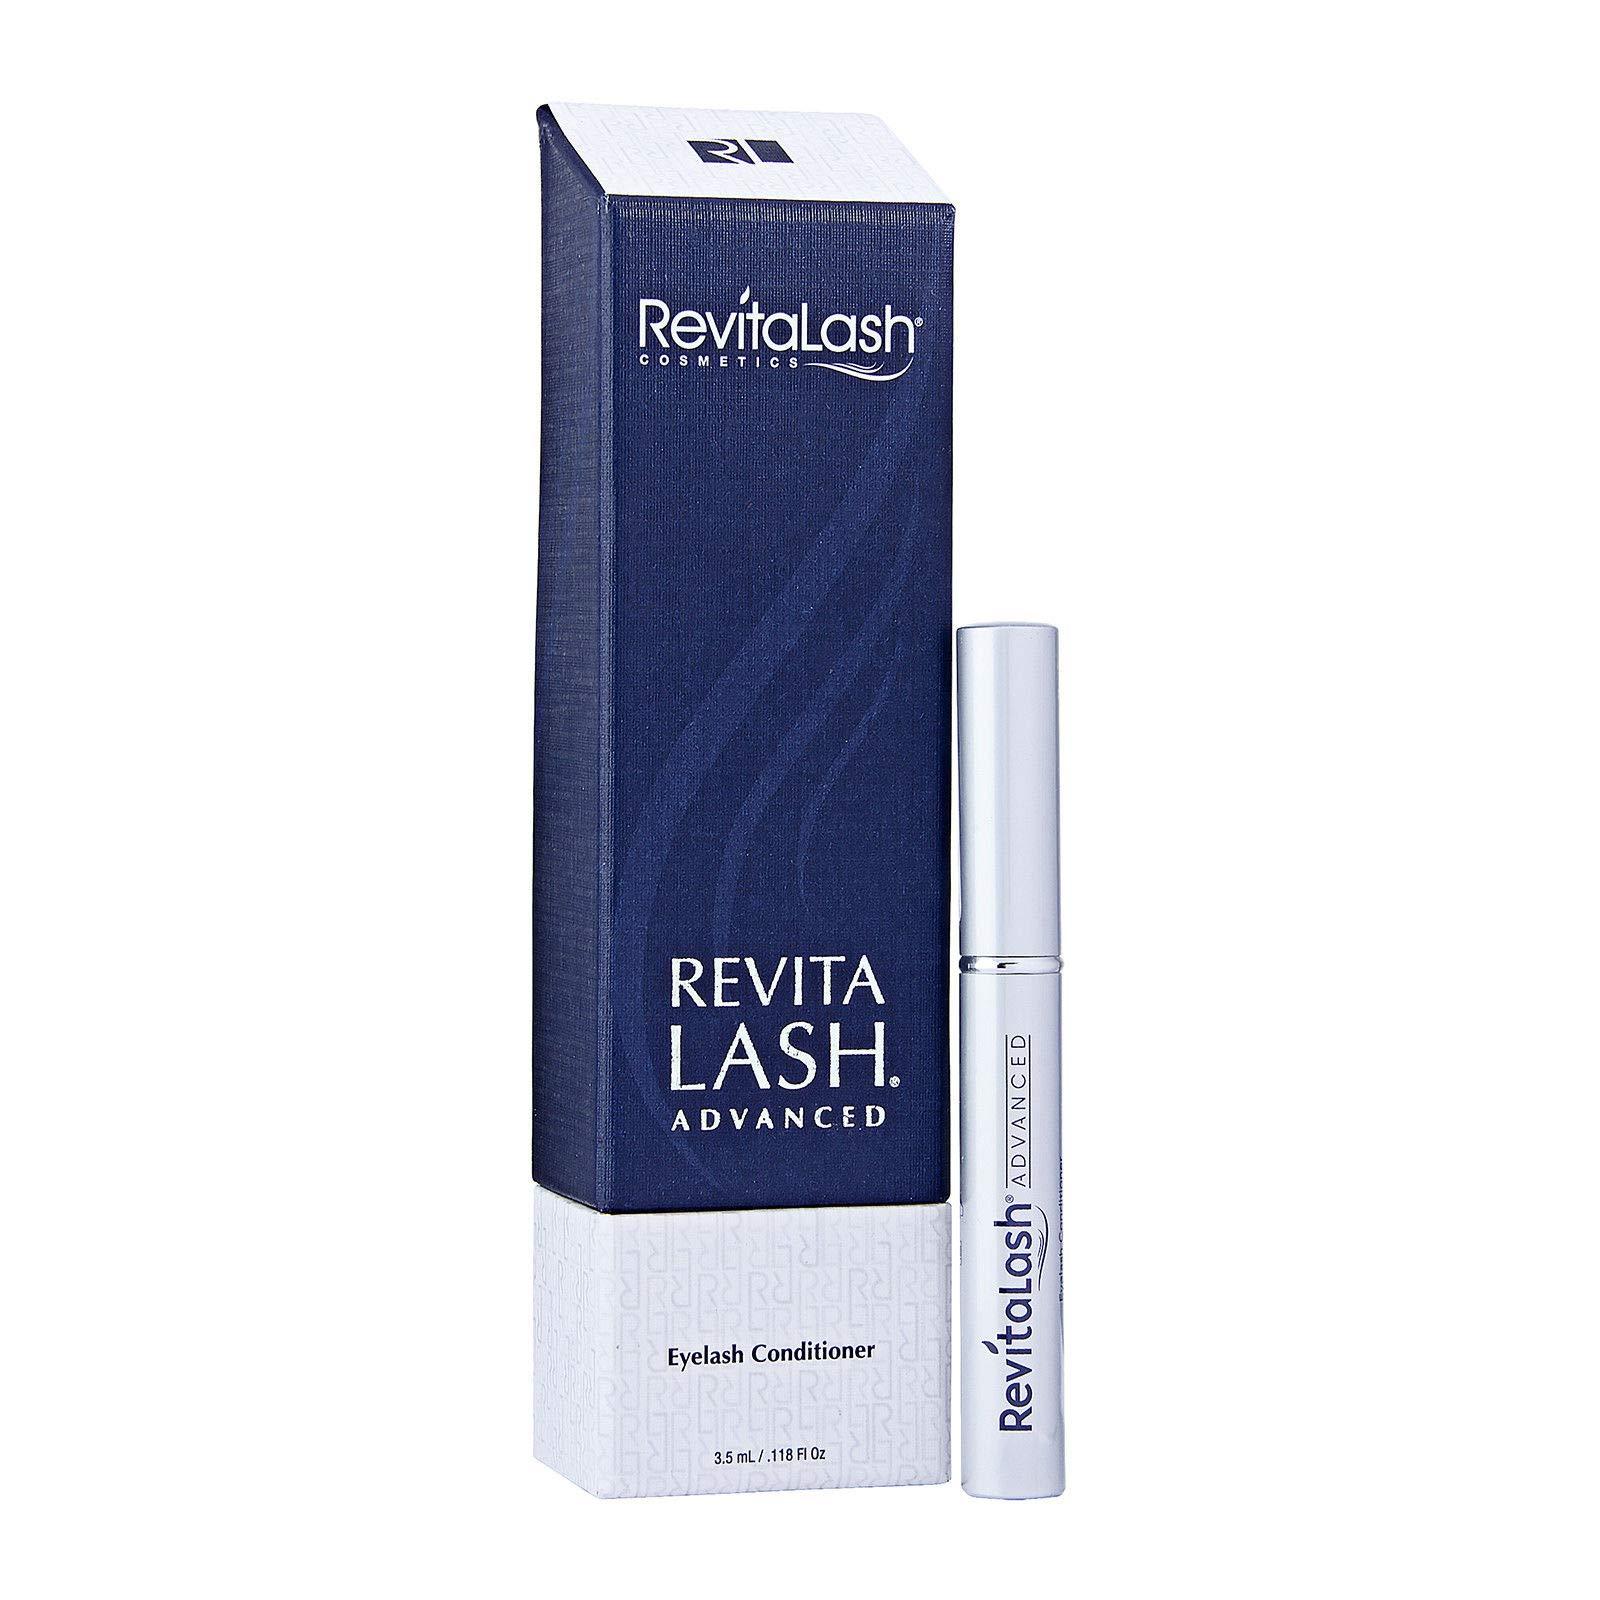 Revita-lash Advanced Eyelash Conditioner 3.5 ml